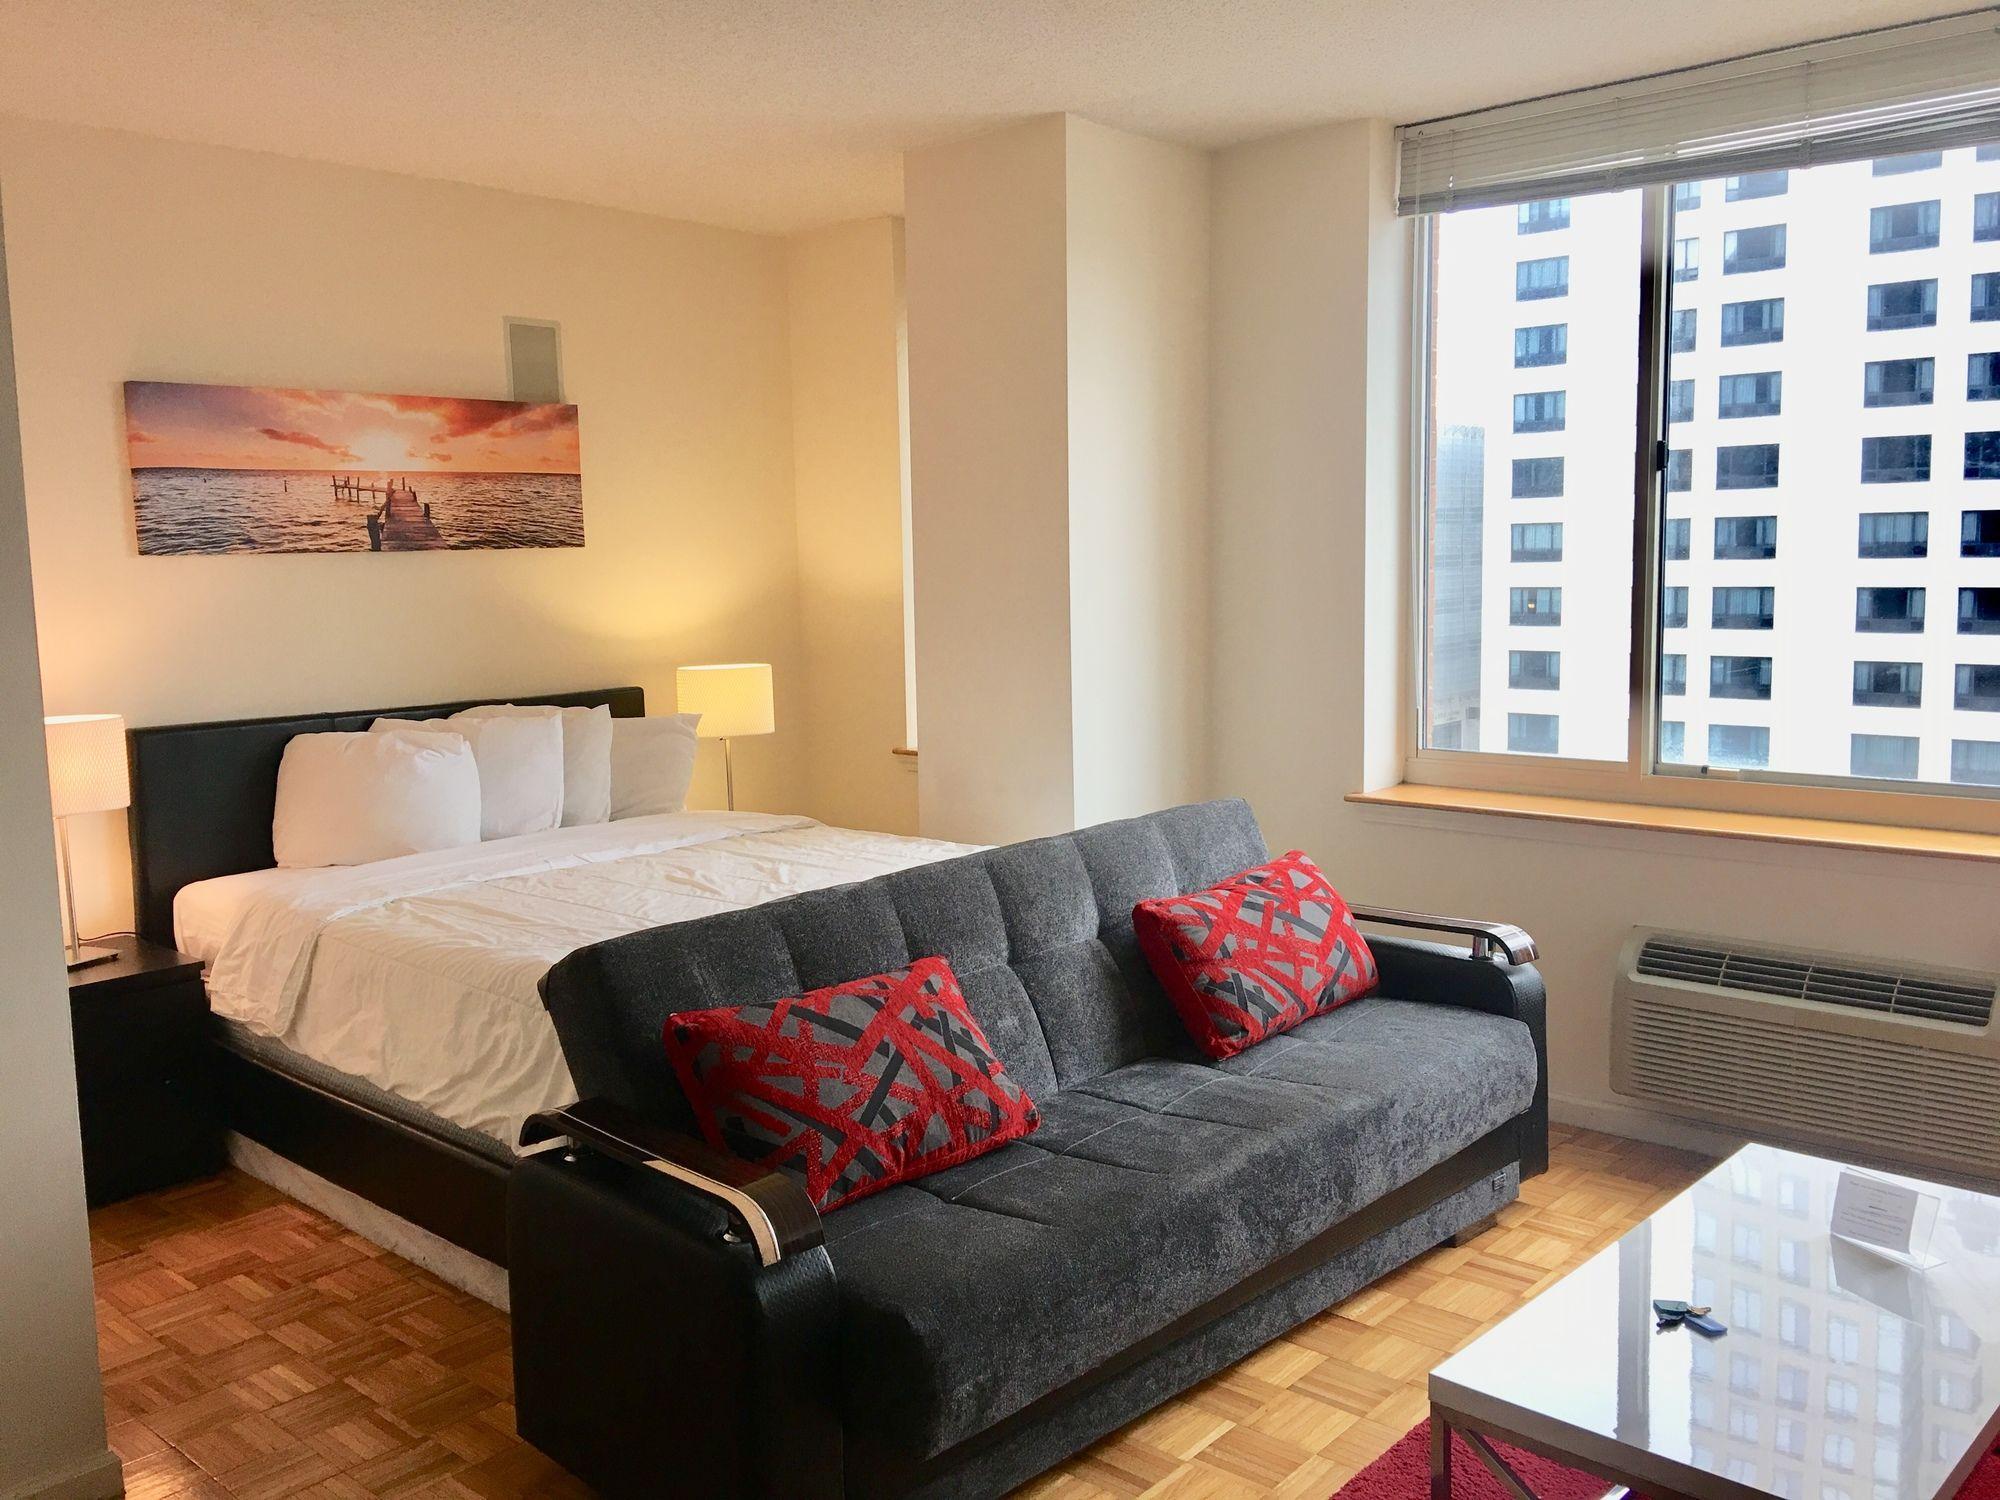 Hotel en Nueva York Skyview Luxury Suites - New York City